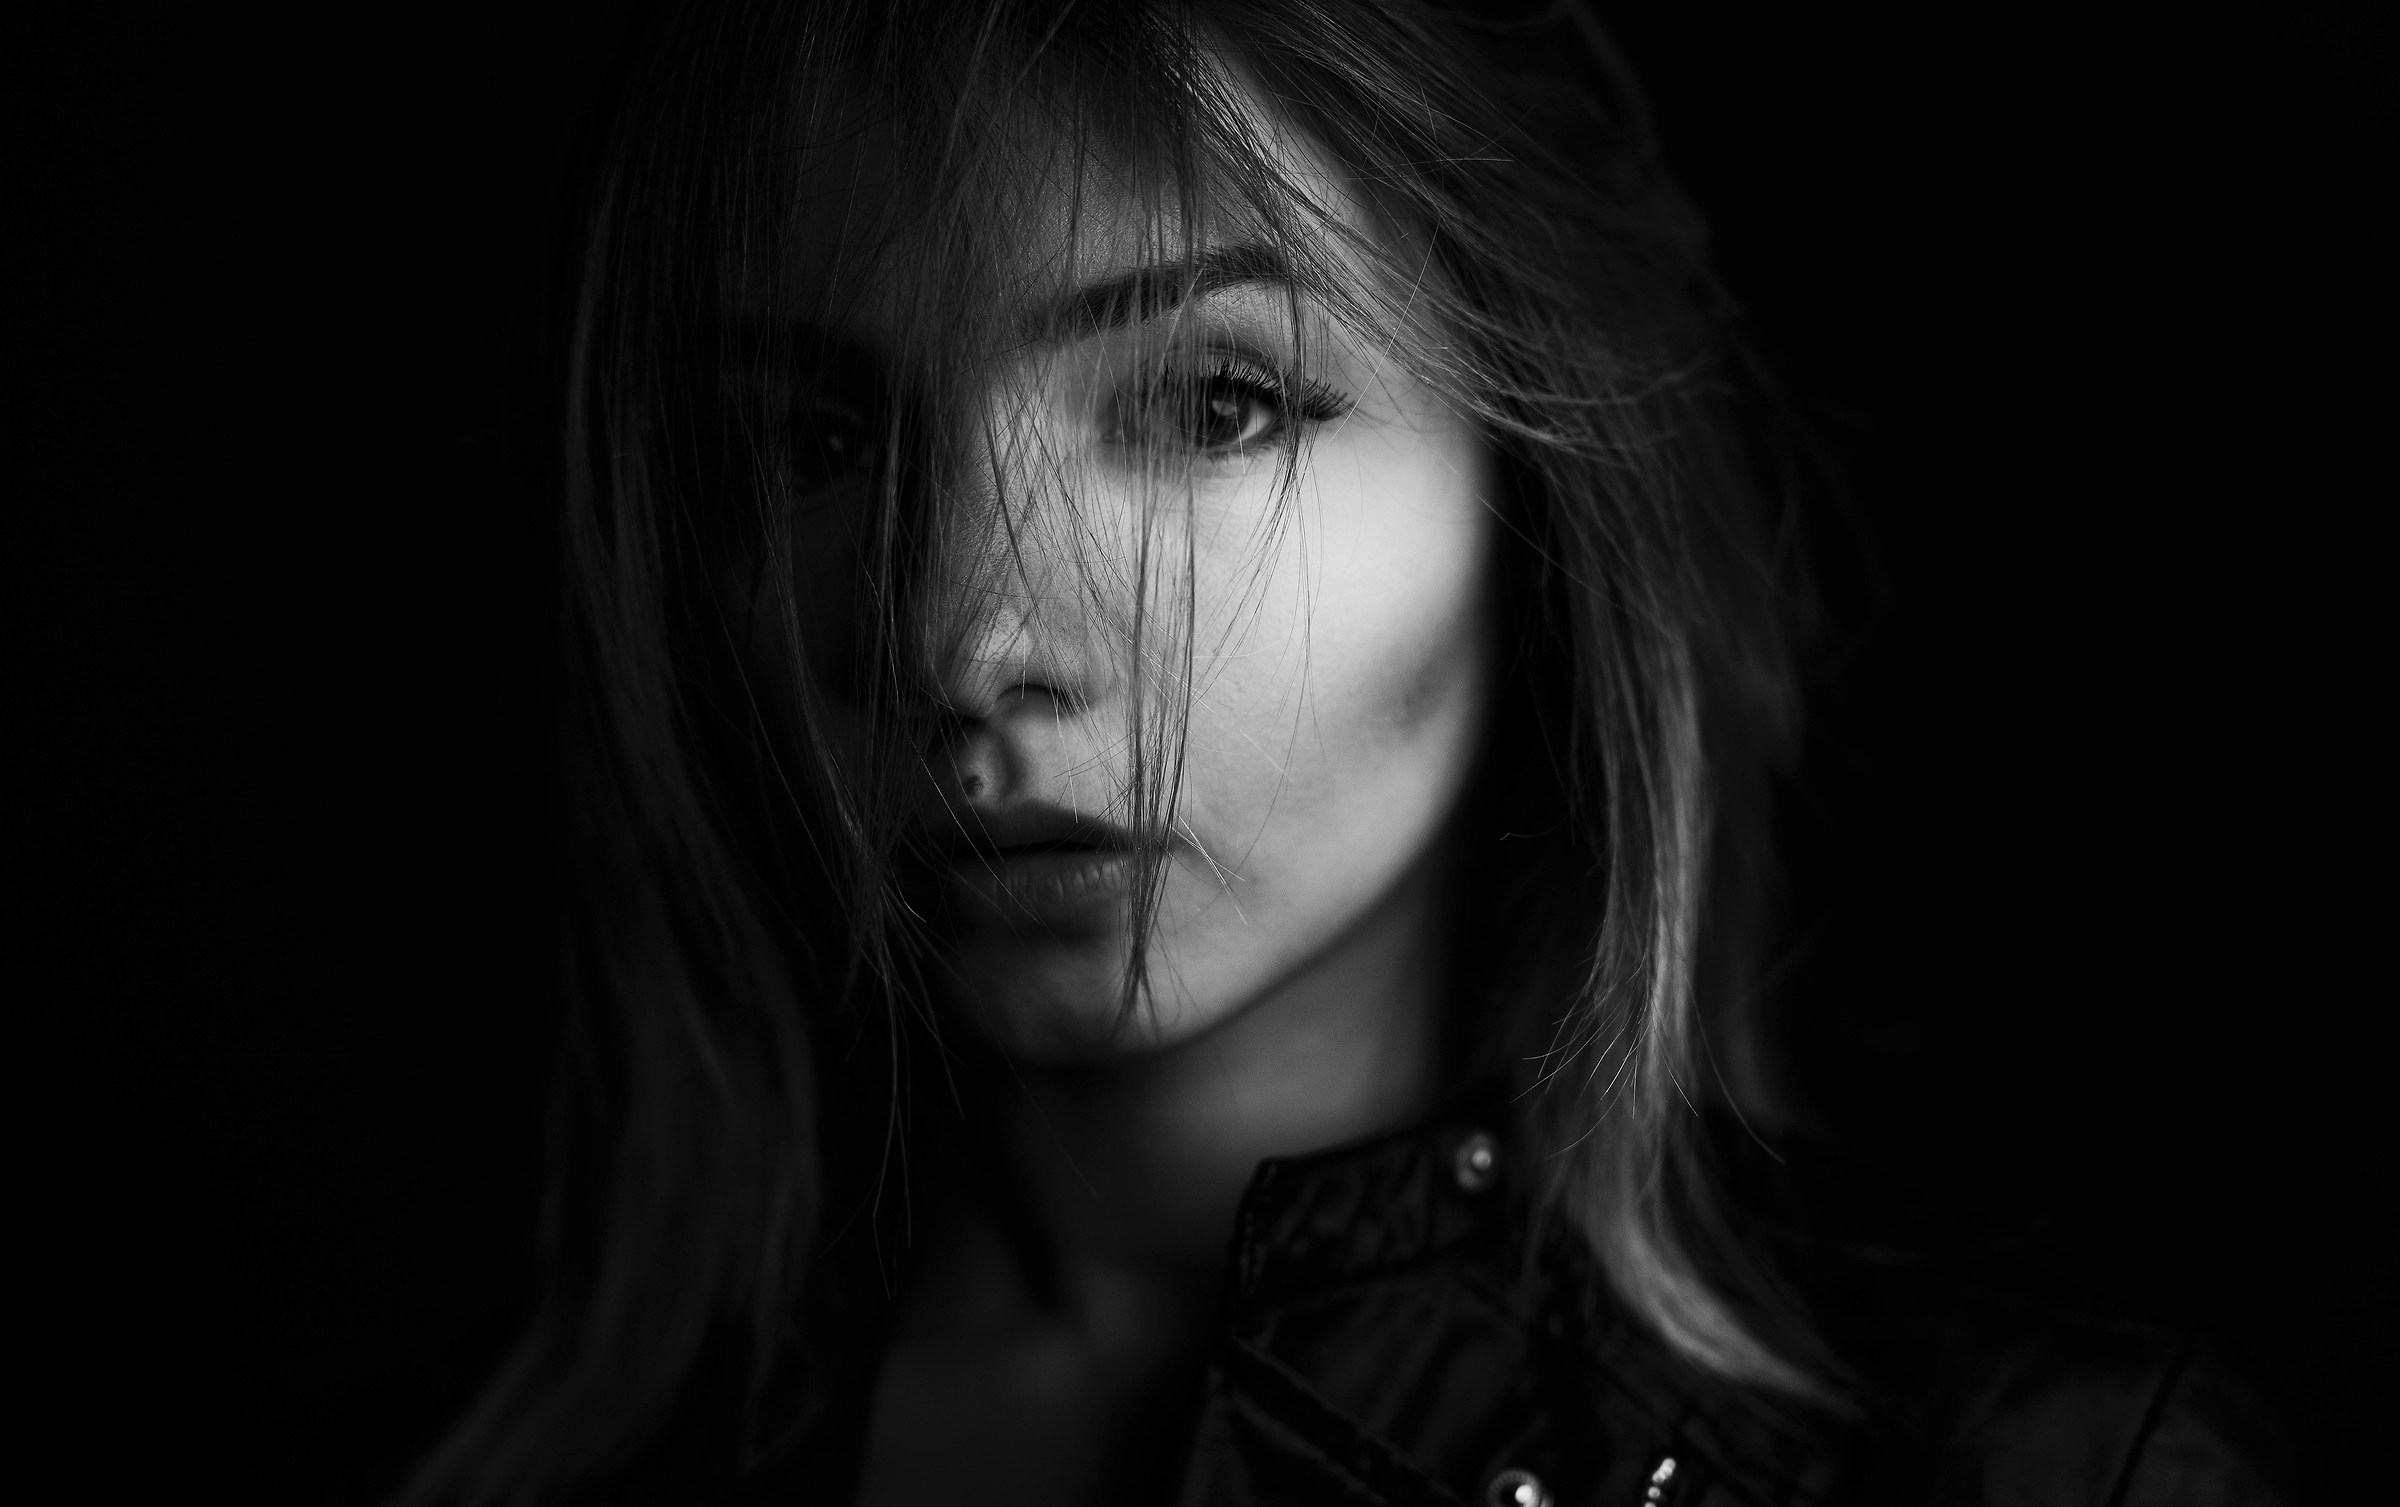 emotional portrait juzaphoto